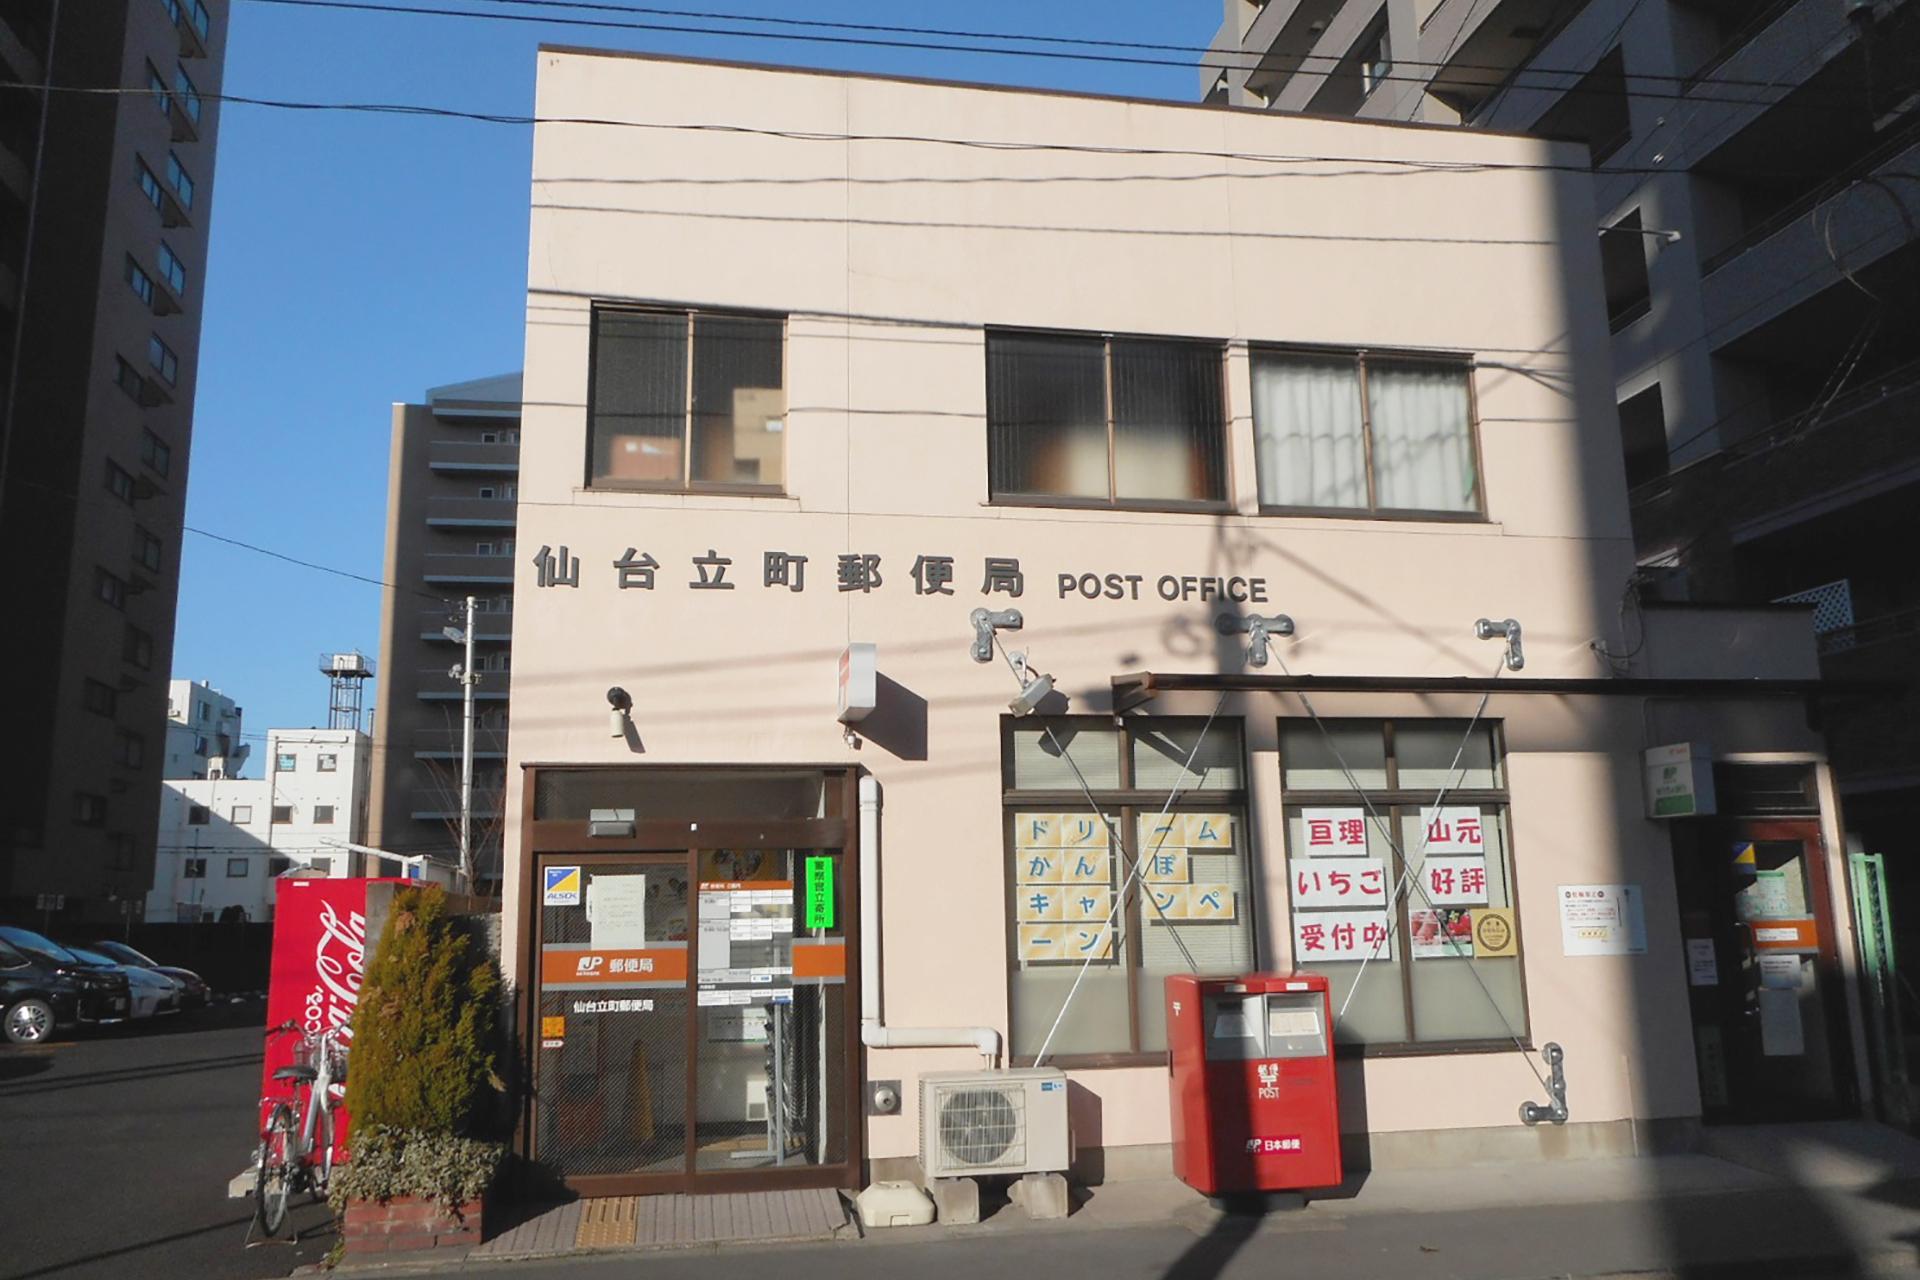 仙台立町郵便局ほか3箇所内外壁塗装工事